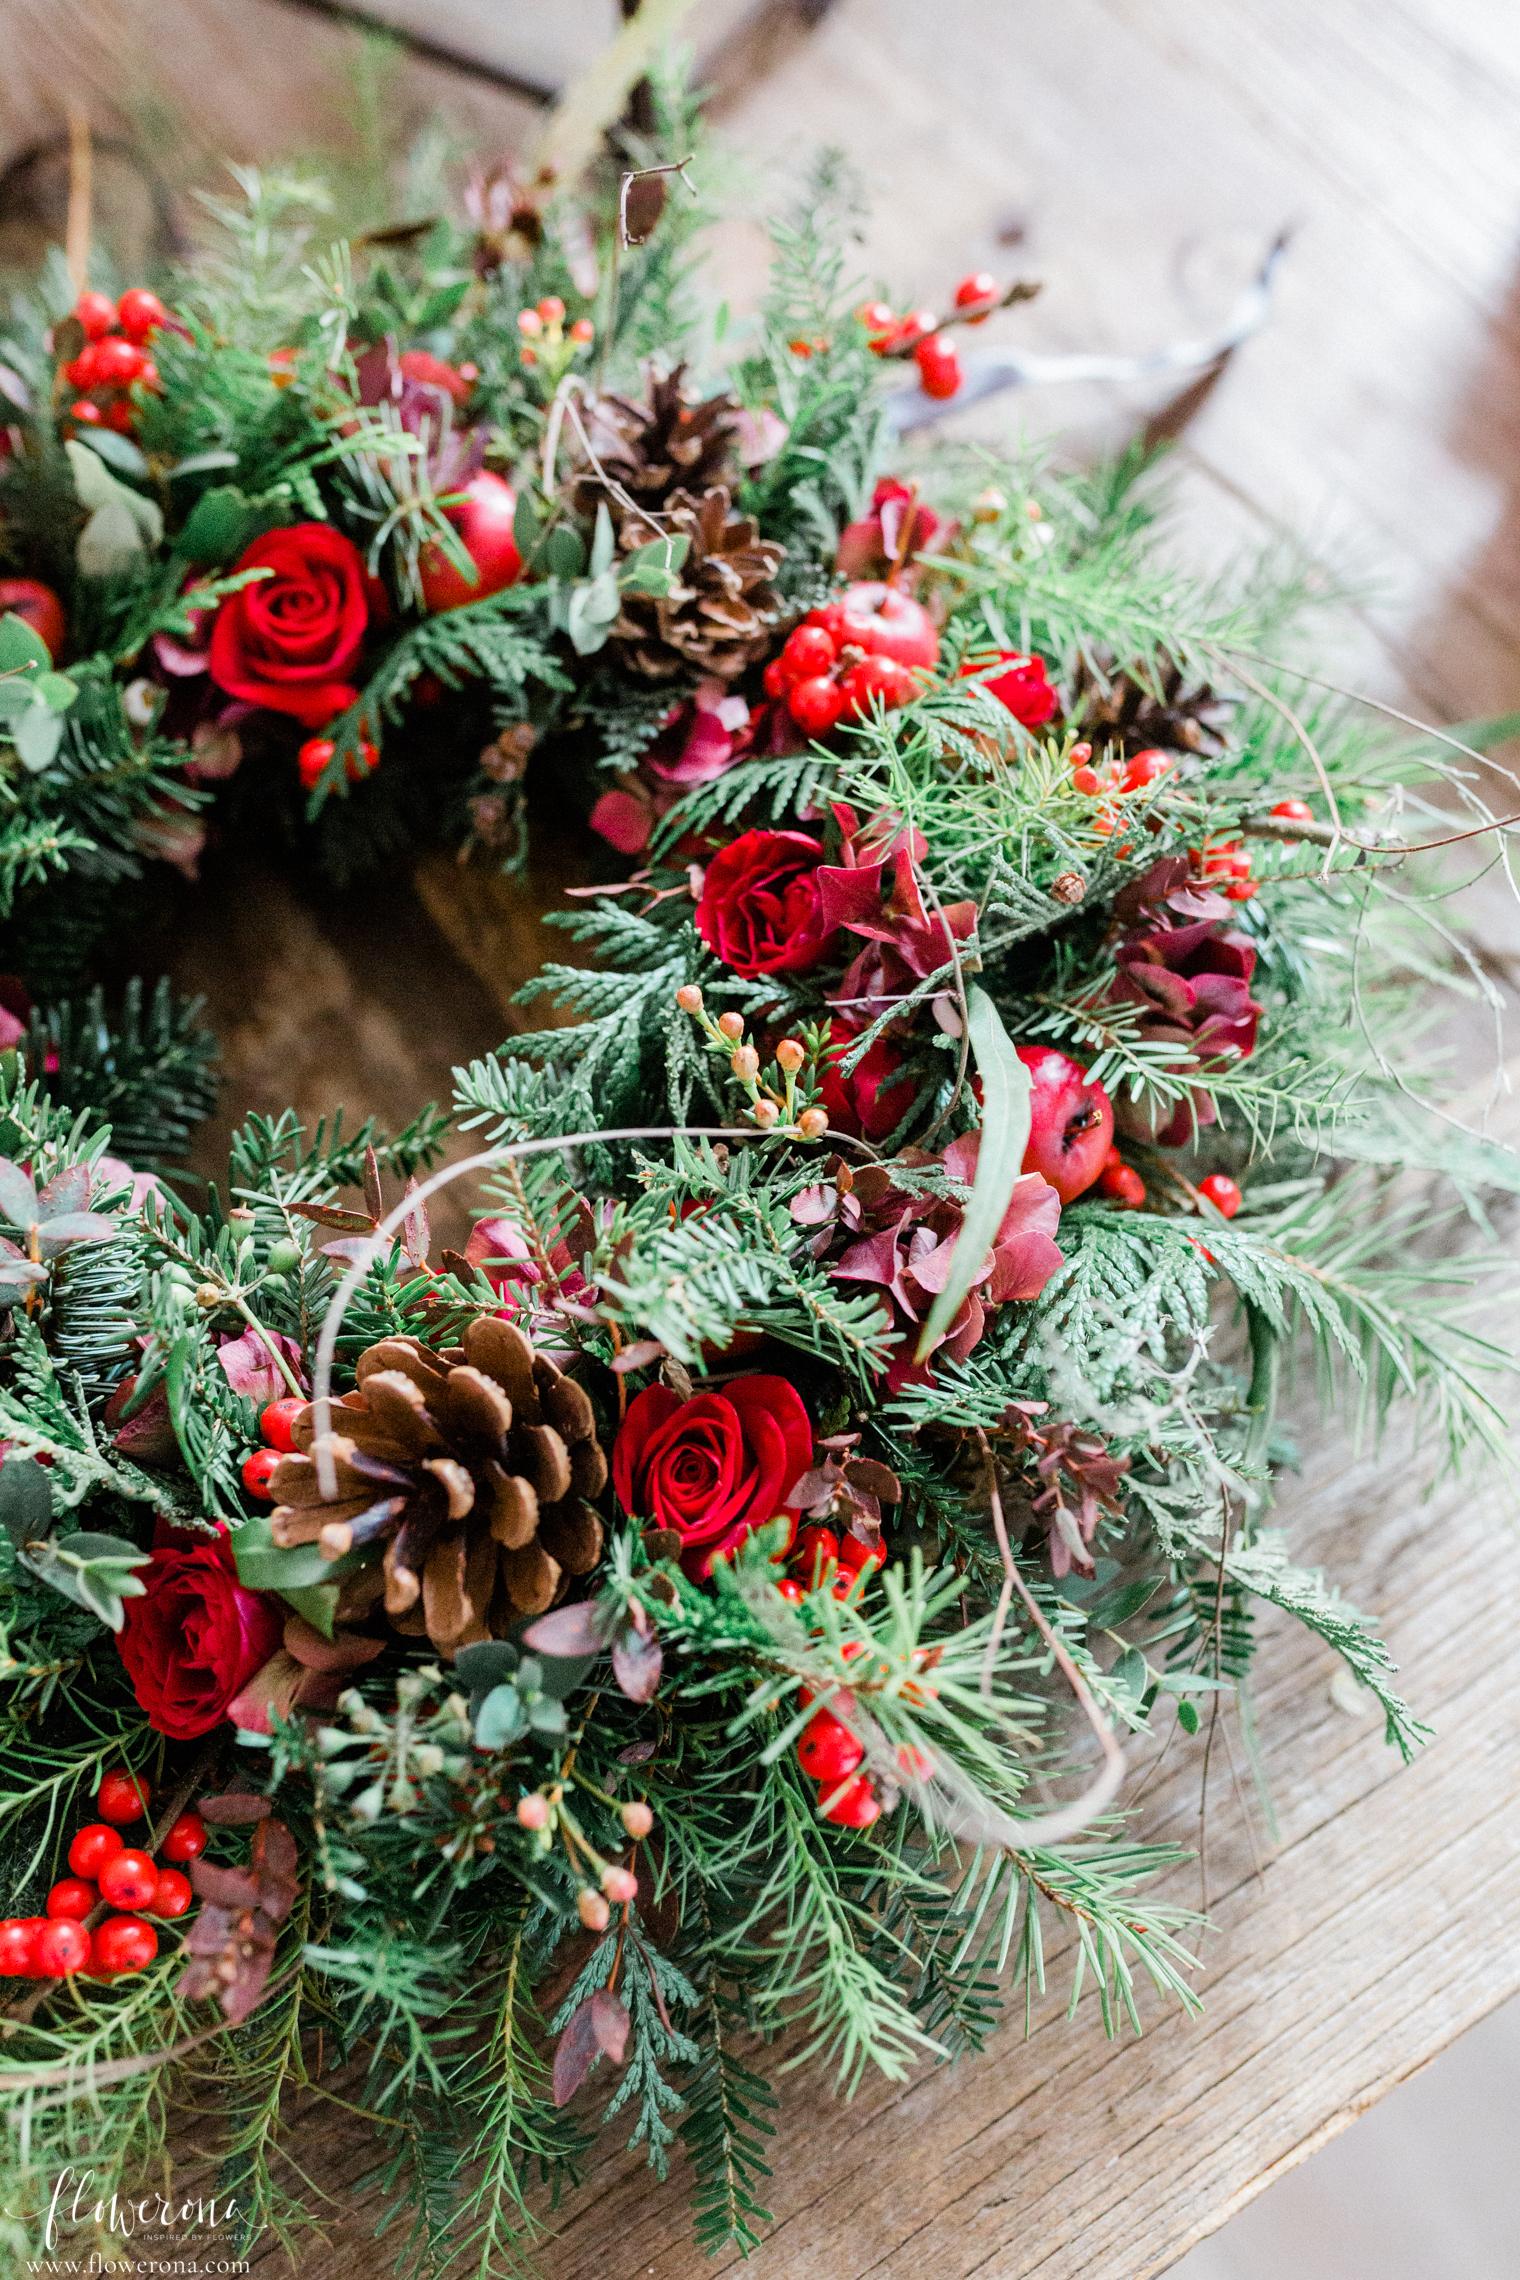 Zita Elze's Flower Shop – Christmas 2020